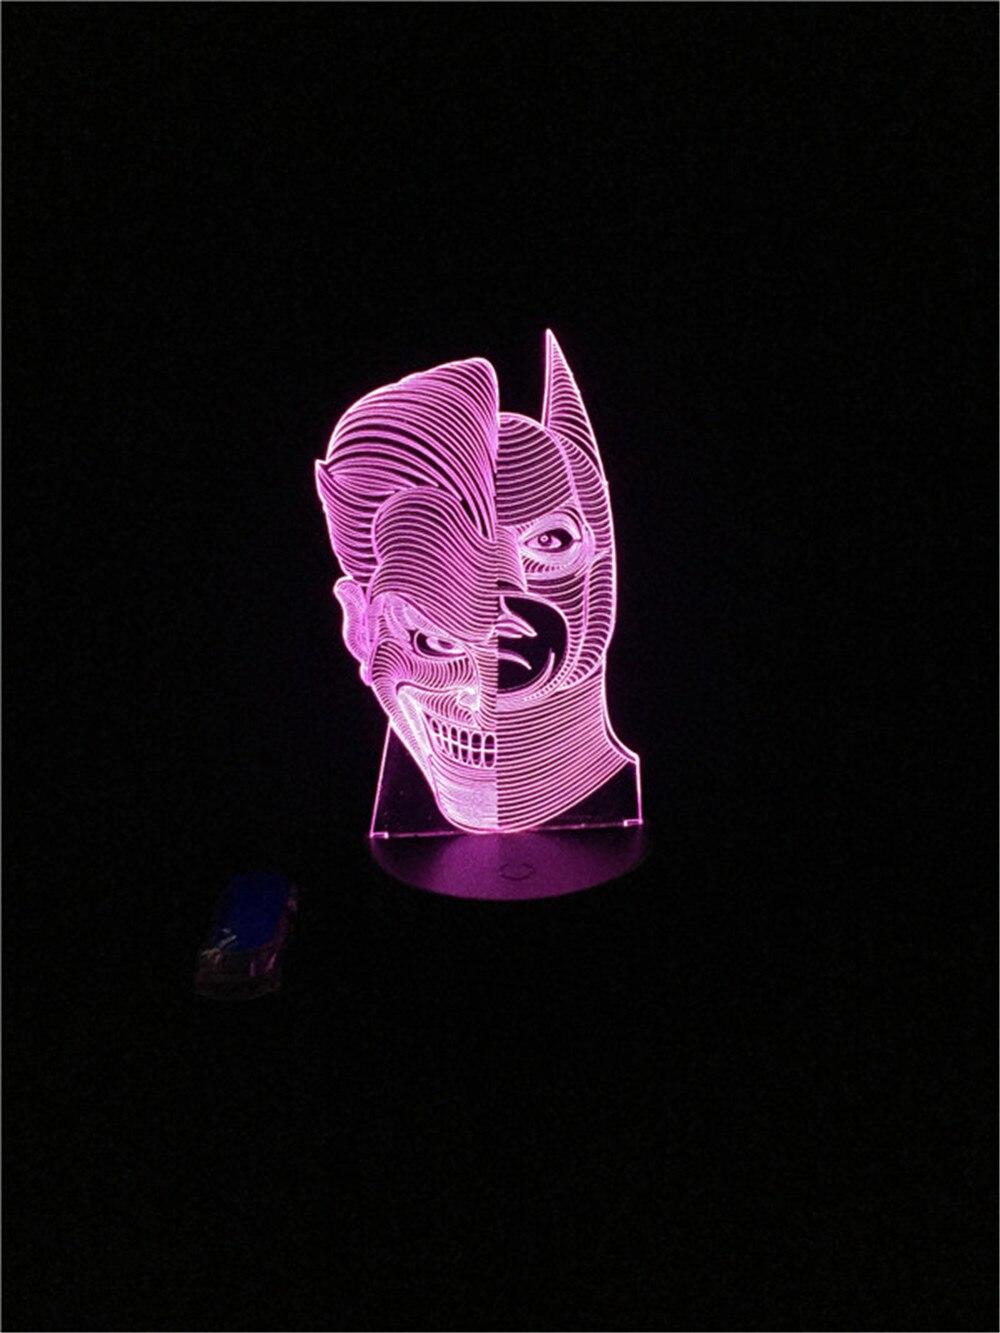 Luzes da Noite batman figura alterar cor luz Function 3 : Stage Lighting Effect/wedding Decor/house Decoration